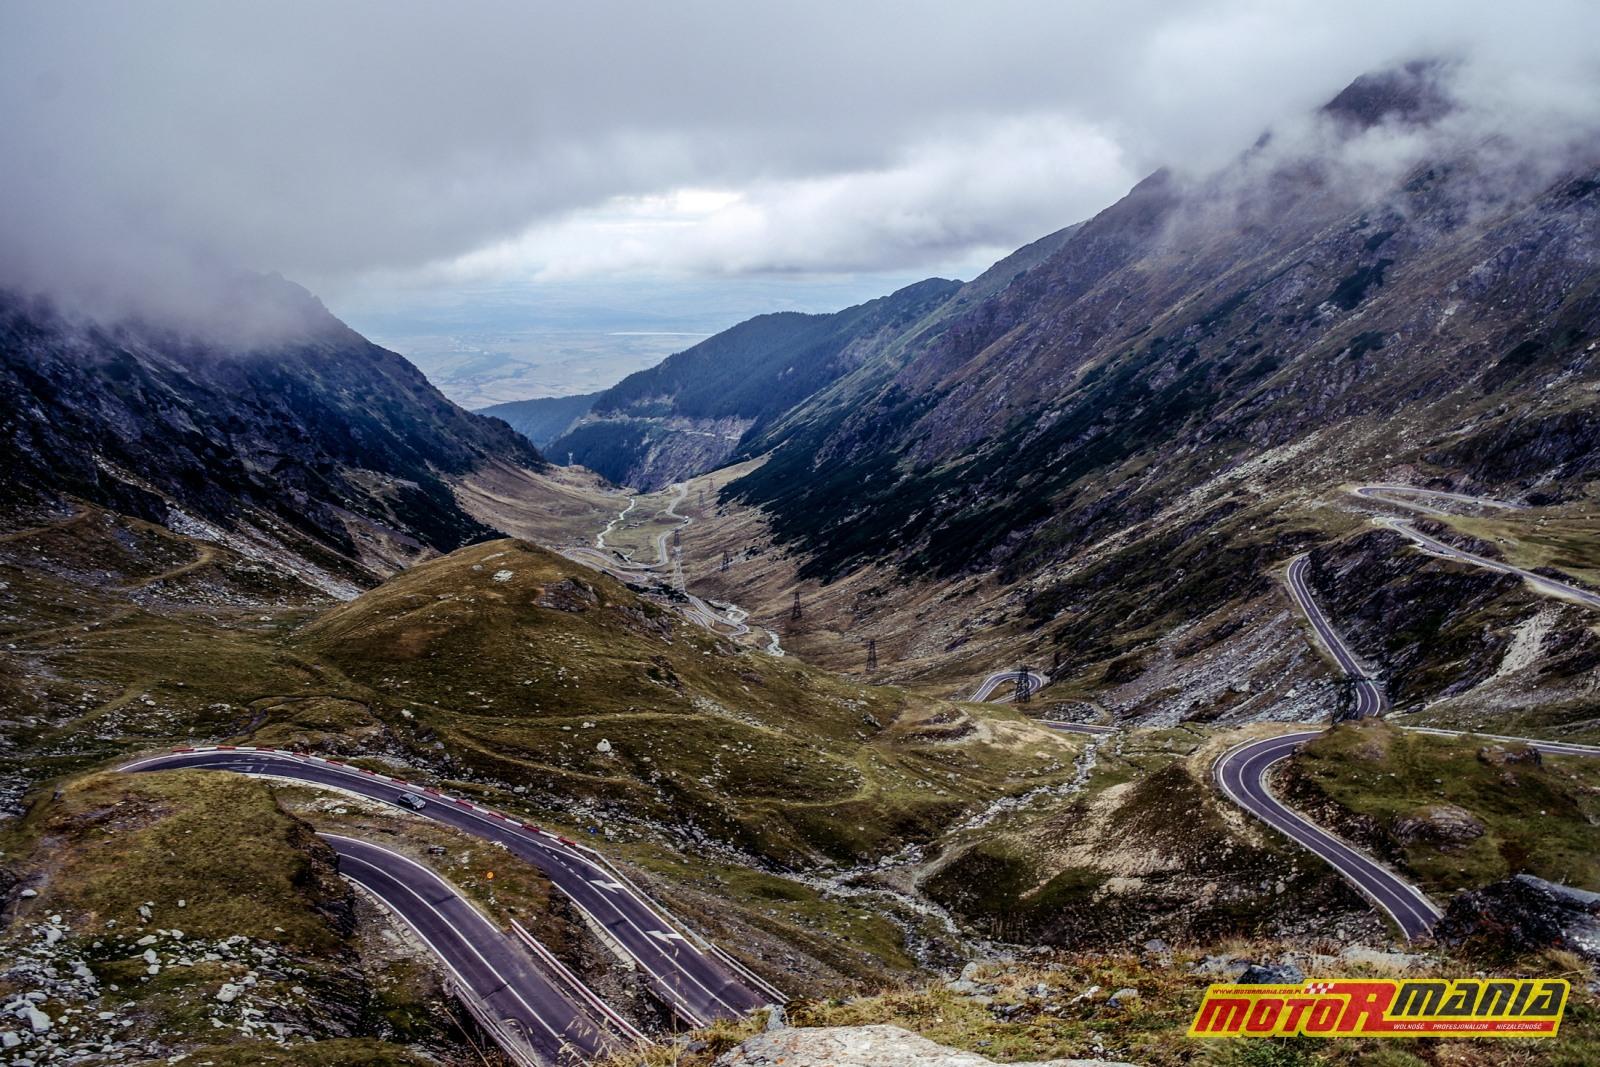 Riding Across Europe - Weronika Kwapisz (7)